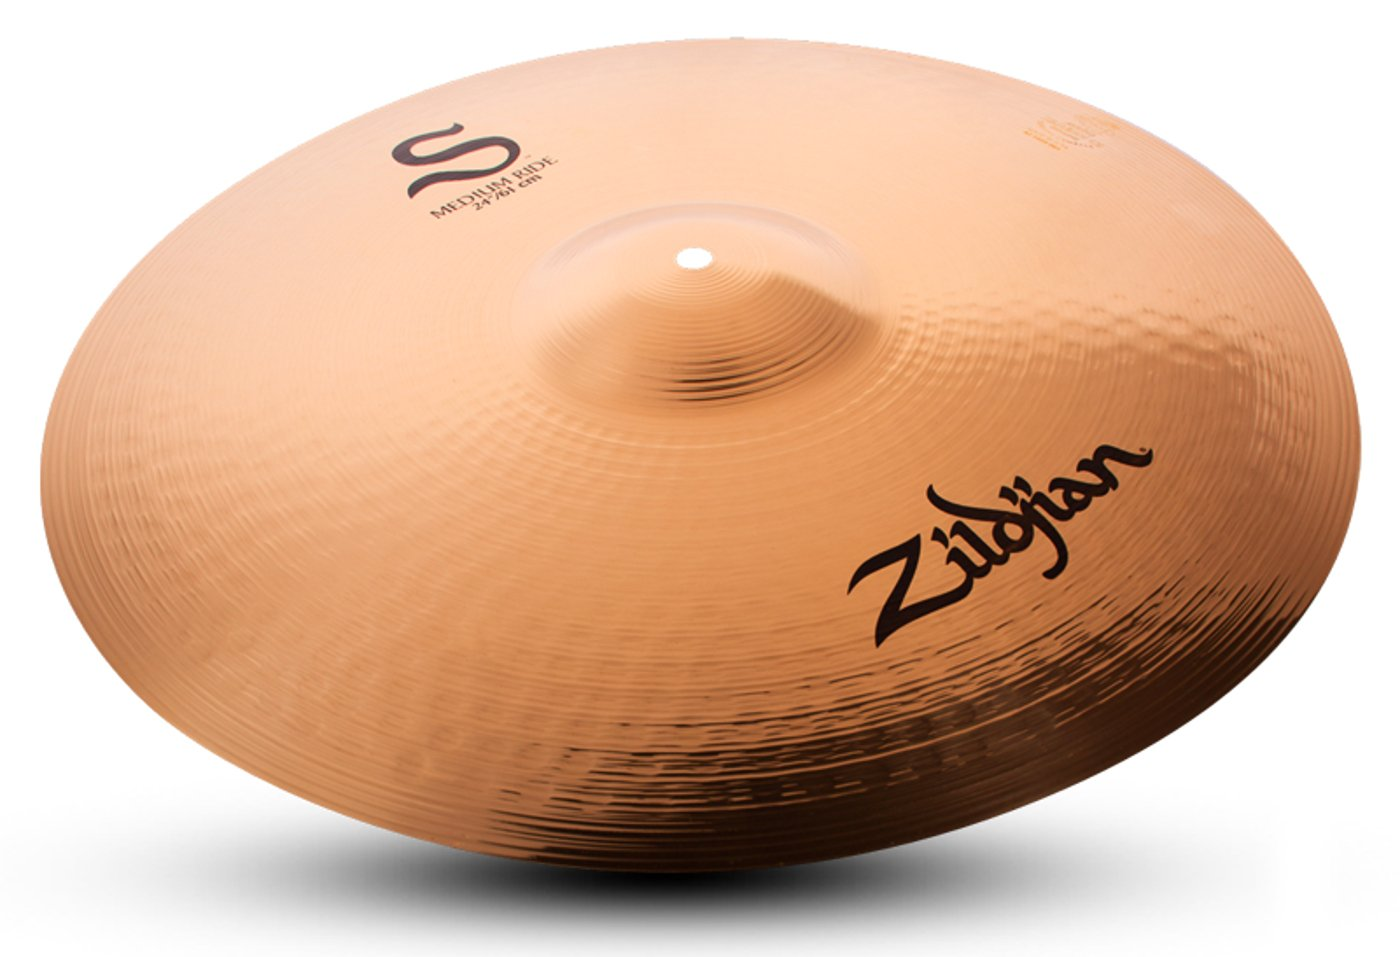 Medium Ride Cymbal